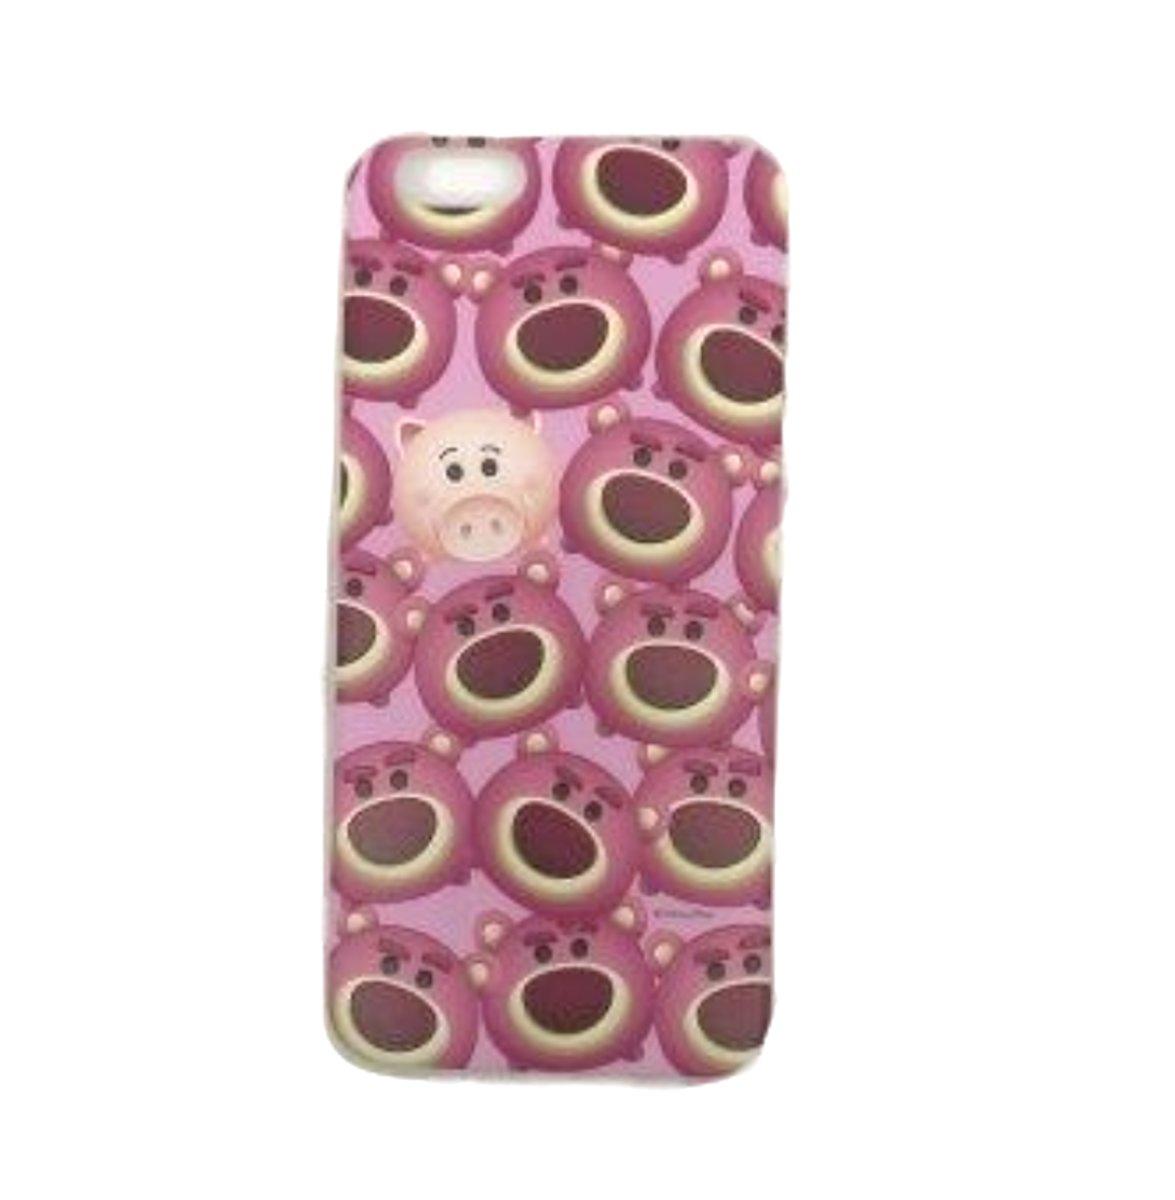 Phone Case IP6 (Lotso) [Licensed by Disney]